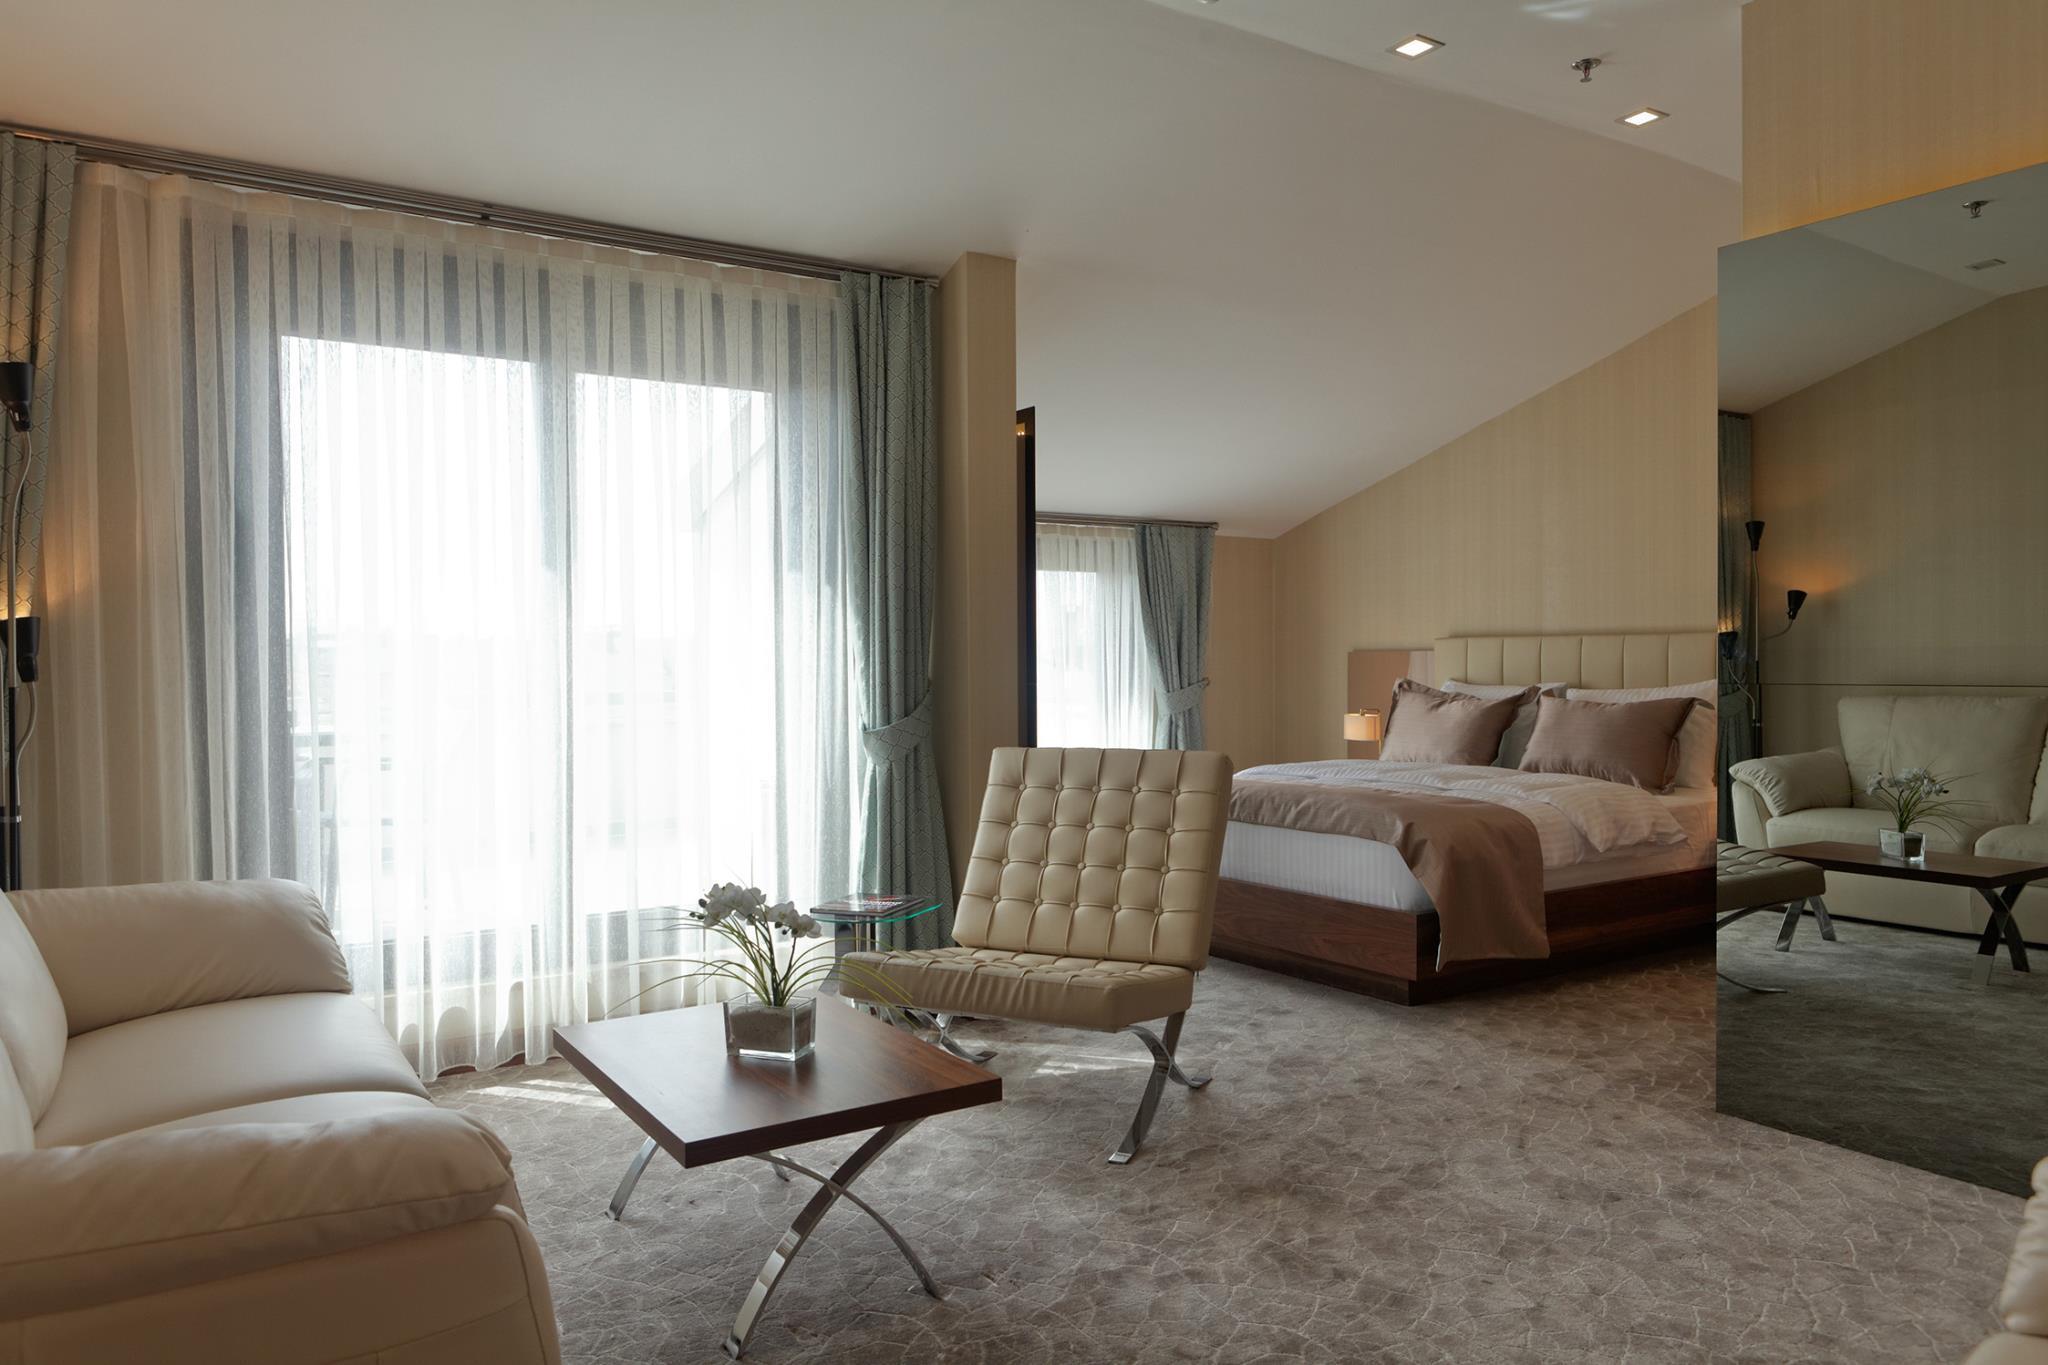 Inera Hotel